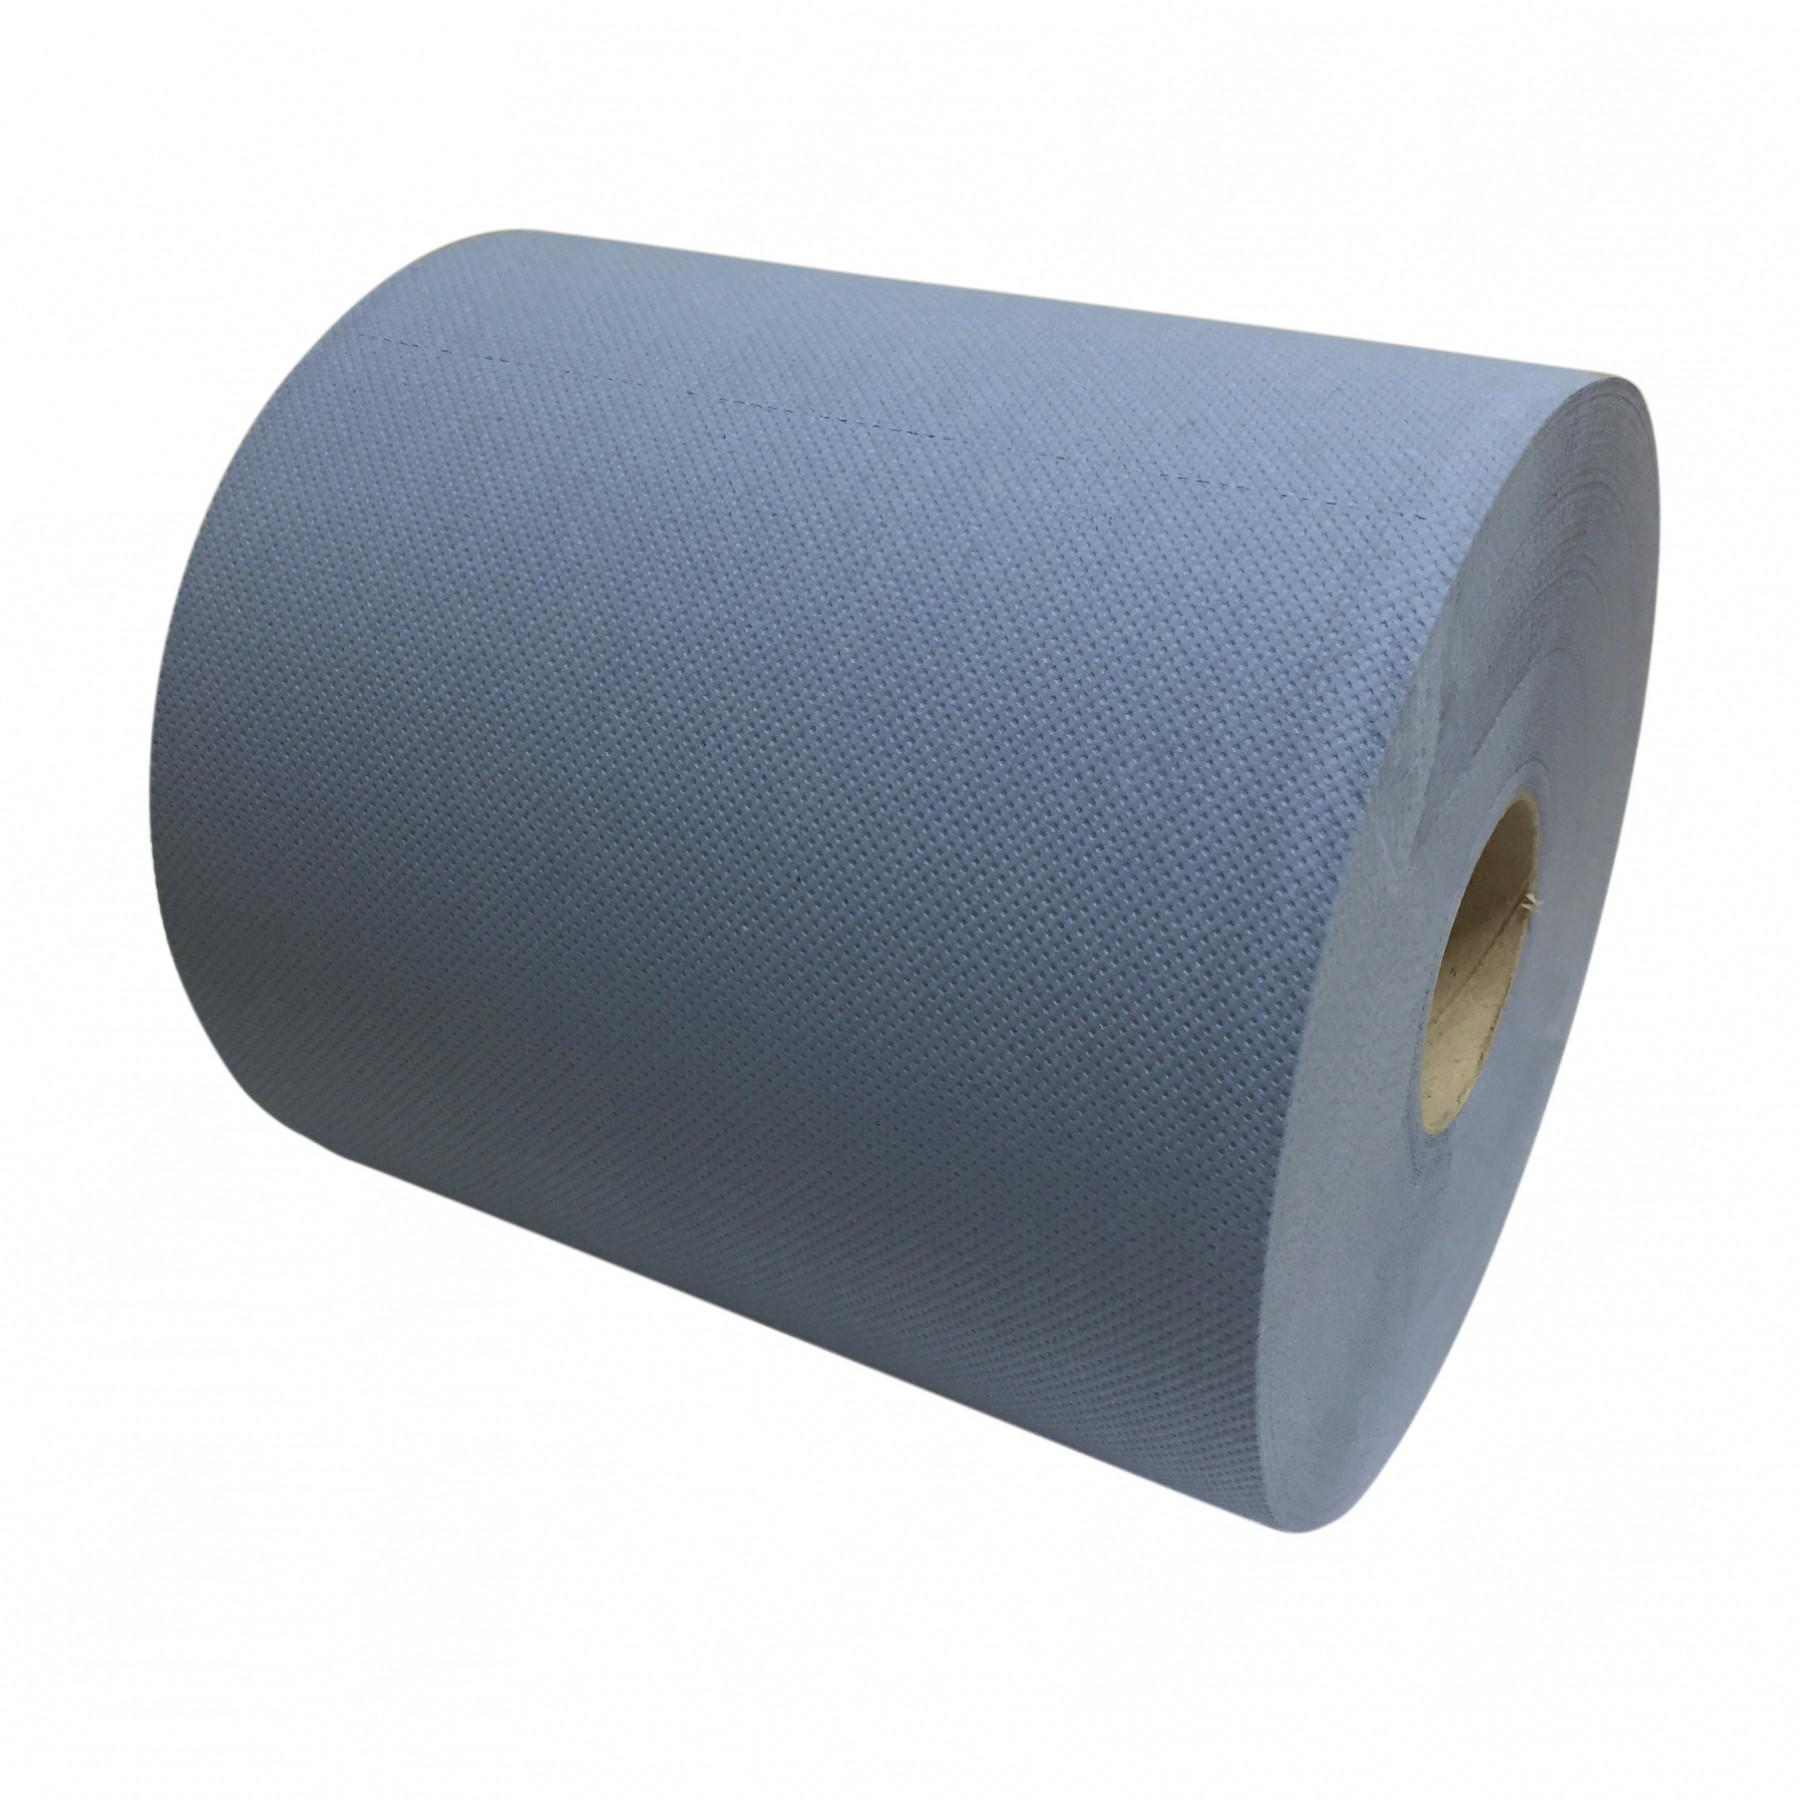 Poetspapier 2laags 37cmx380m blauw(per rol)